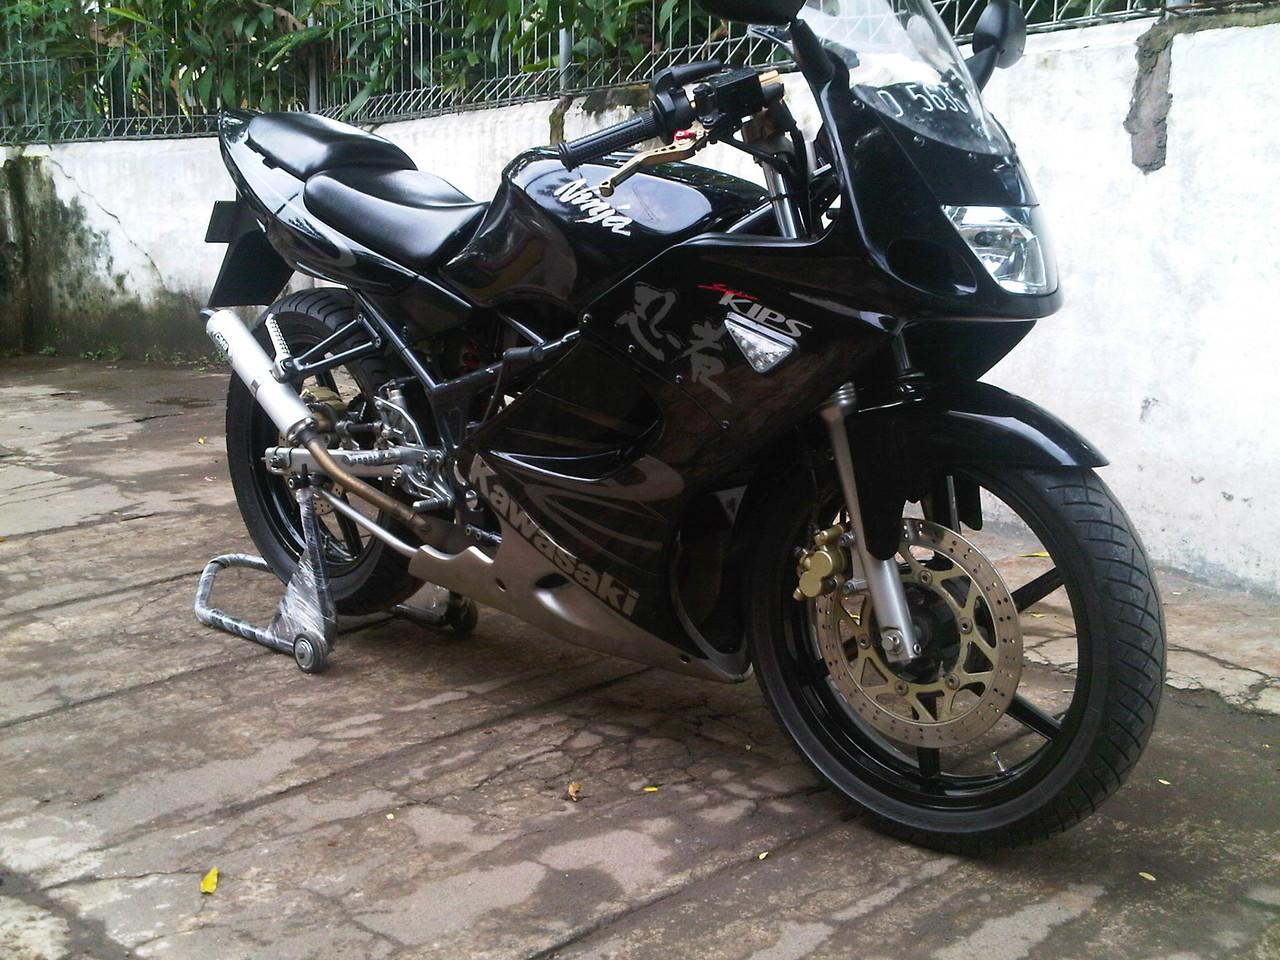 online motor: kawasaki ninja rr tahun 2013 harga rp 9,500,000